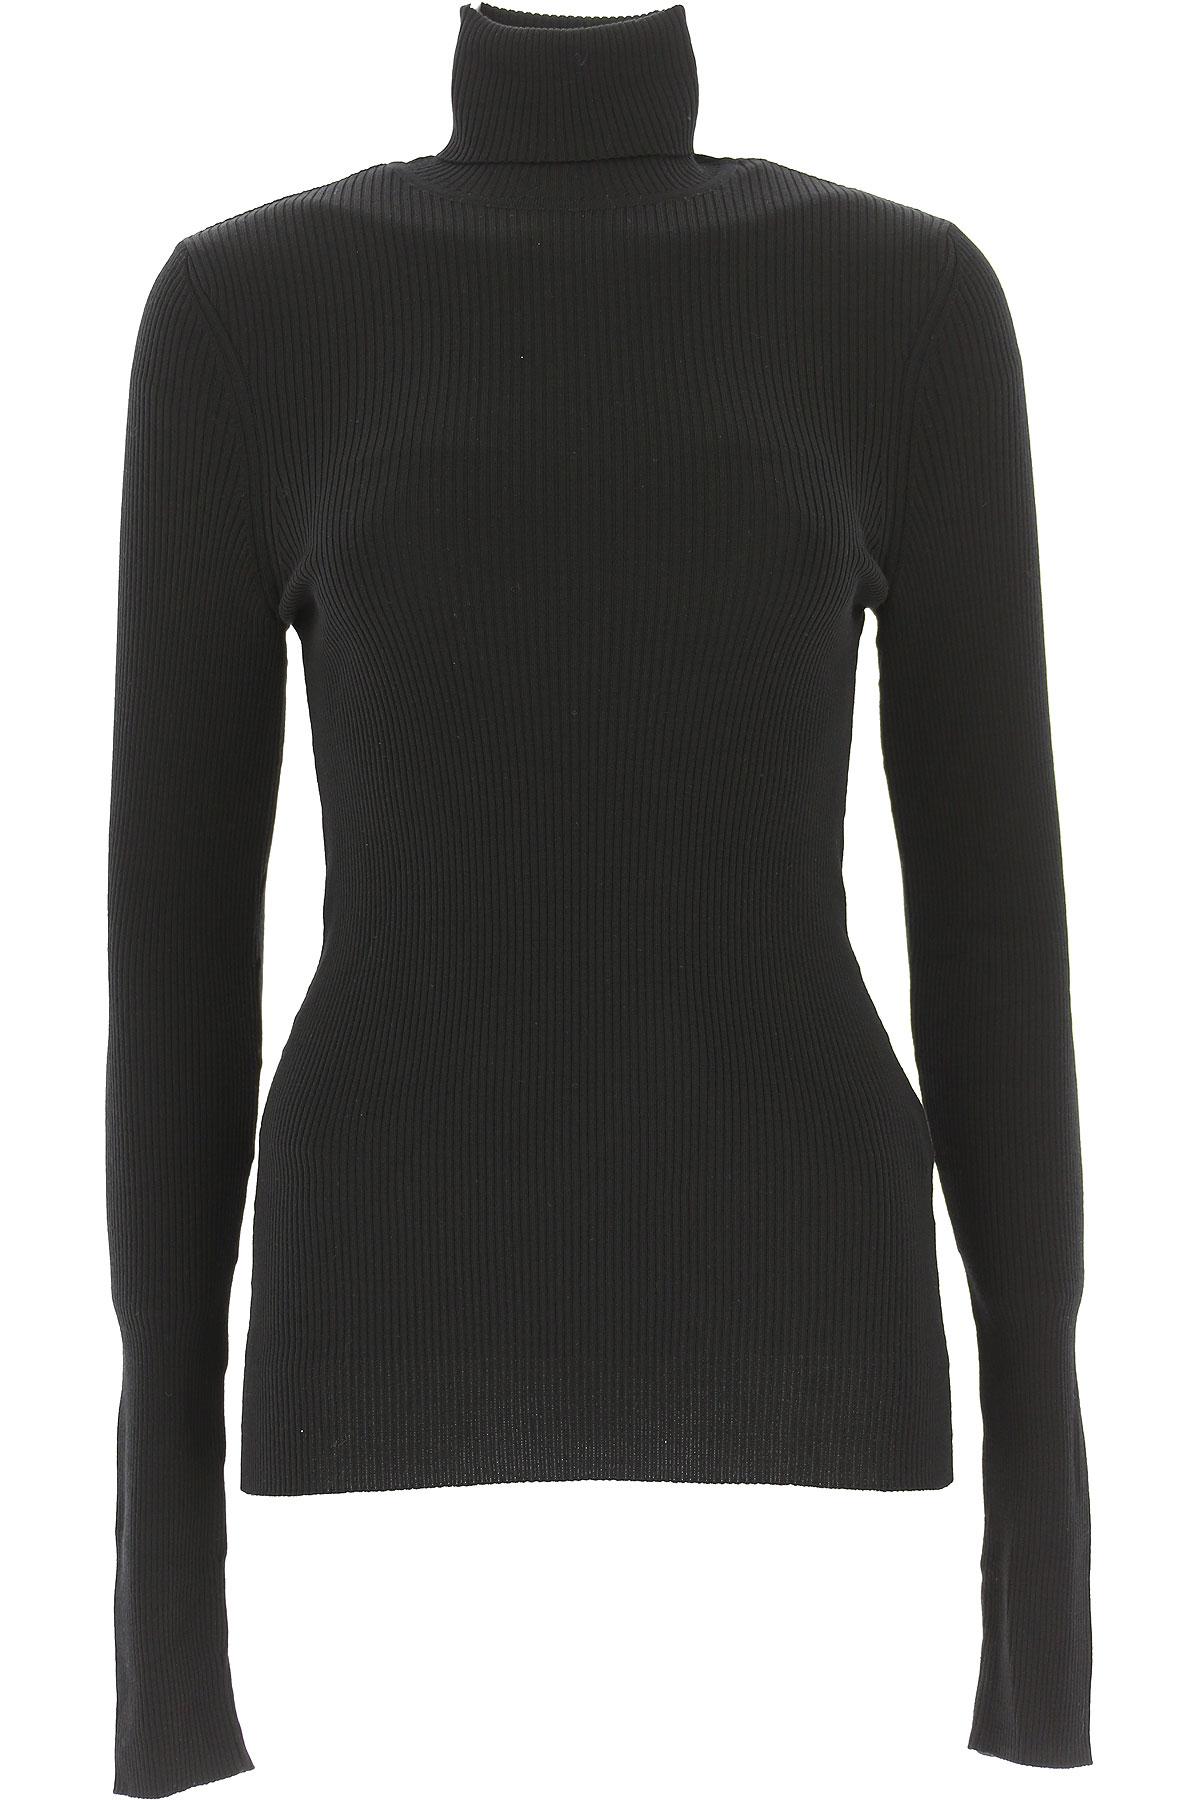 Image of Sibel Saral Sweater for Women Jumper, Black, Superfine Wool, 2017, 6 8